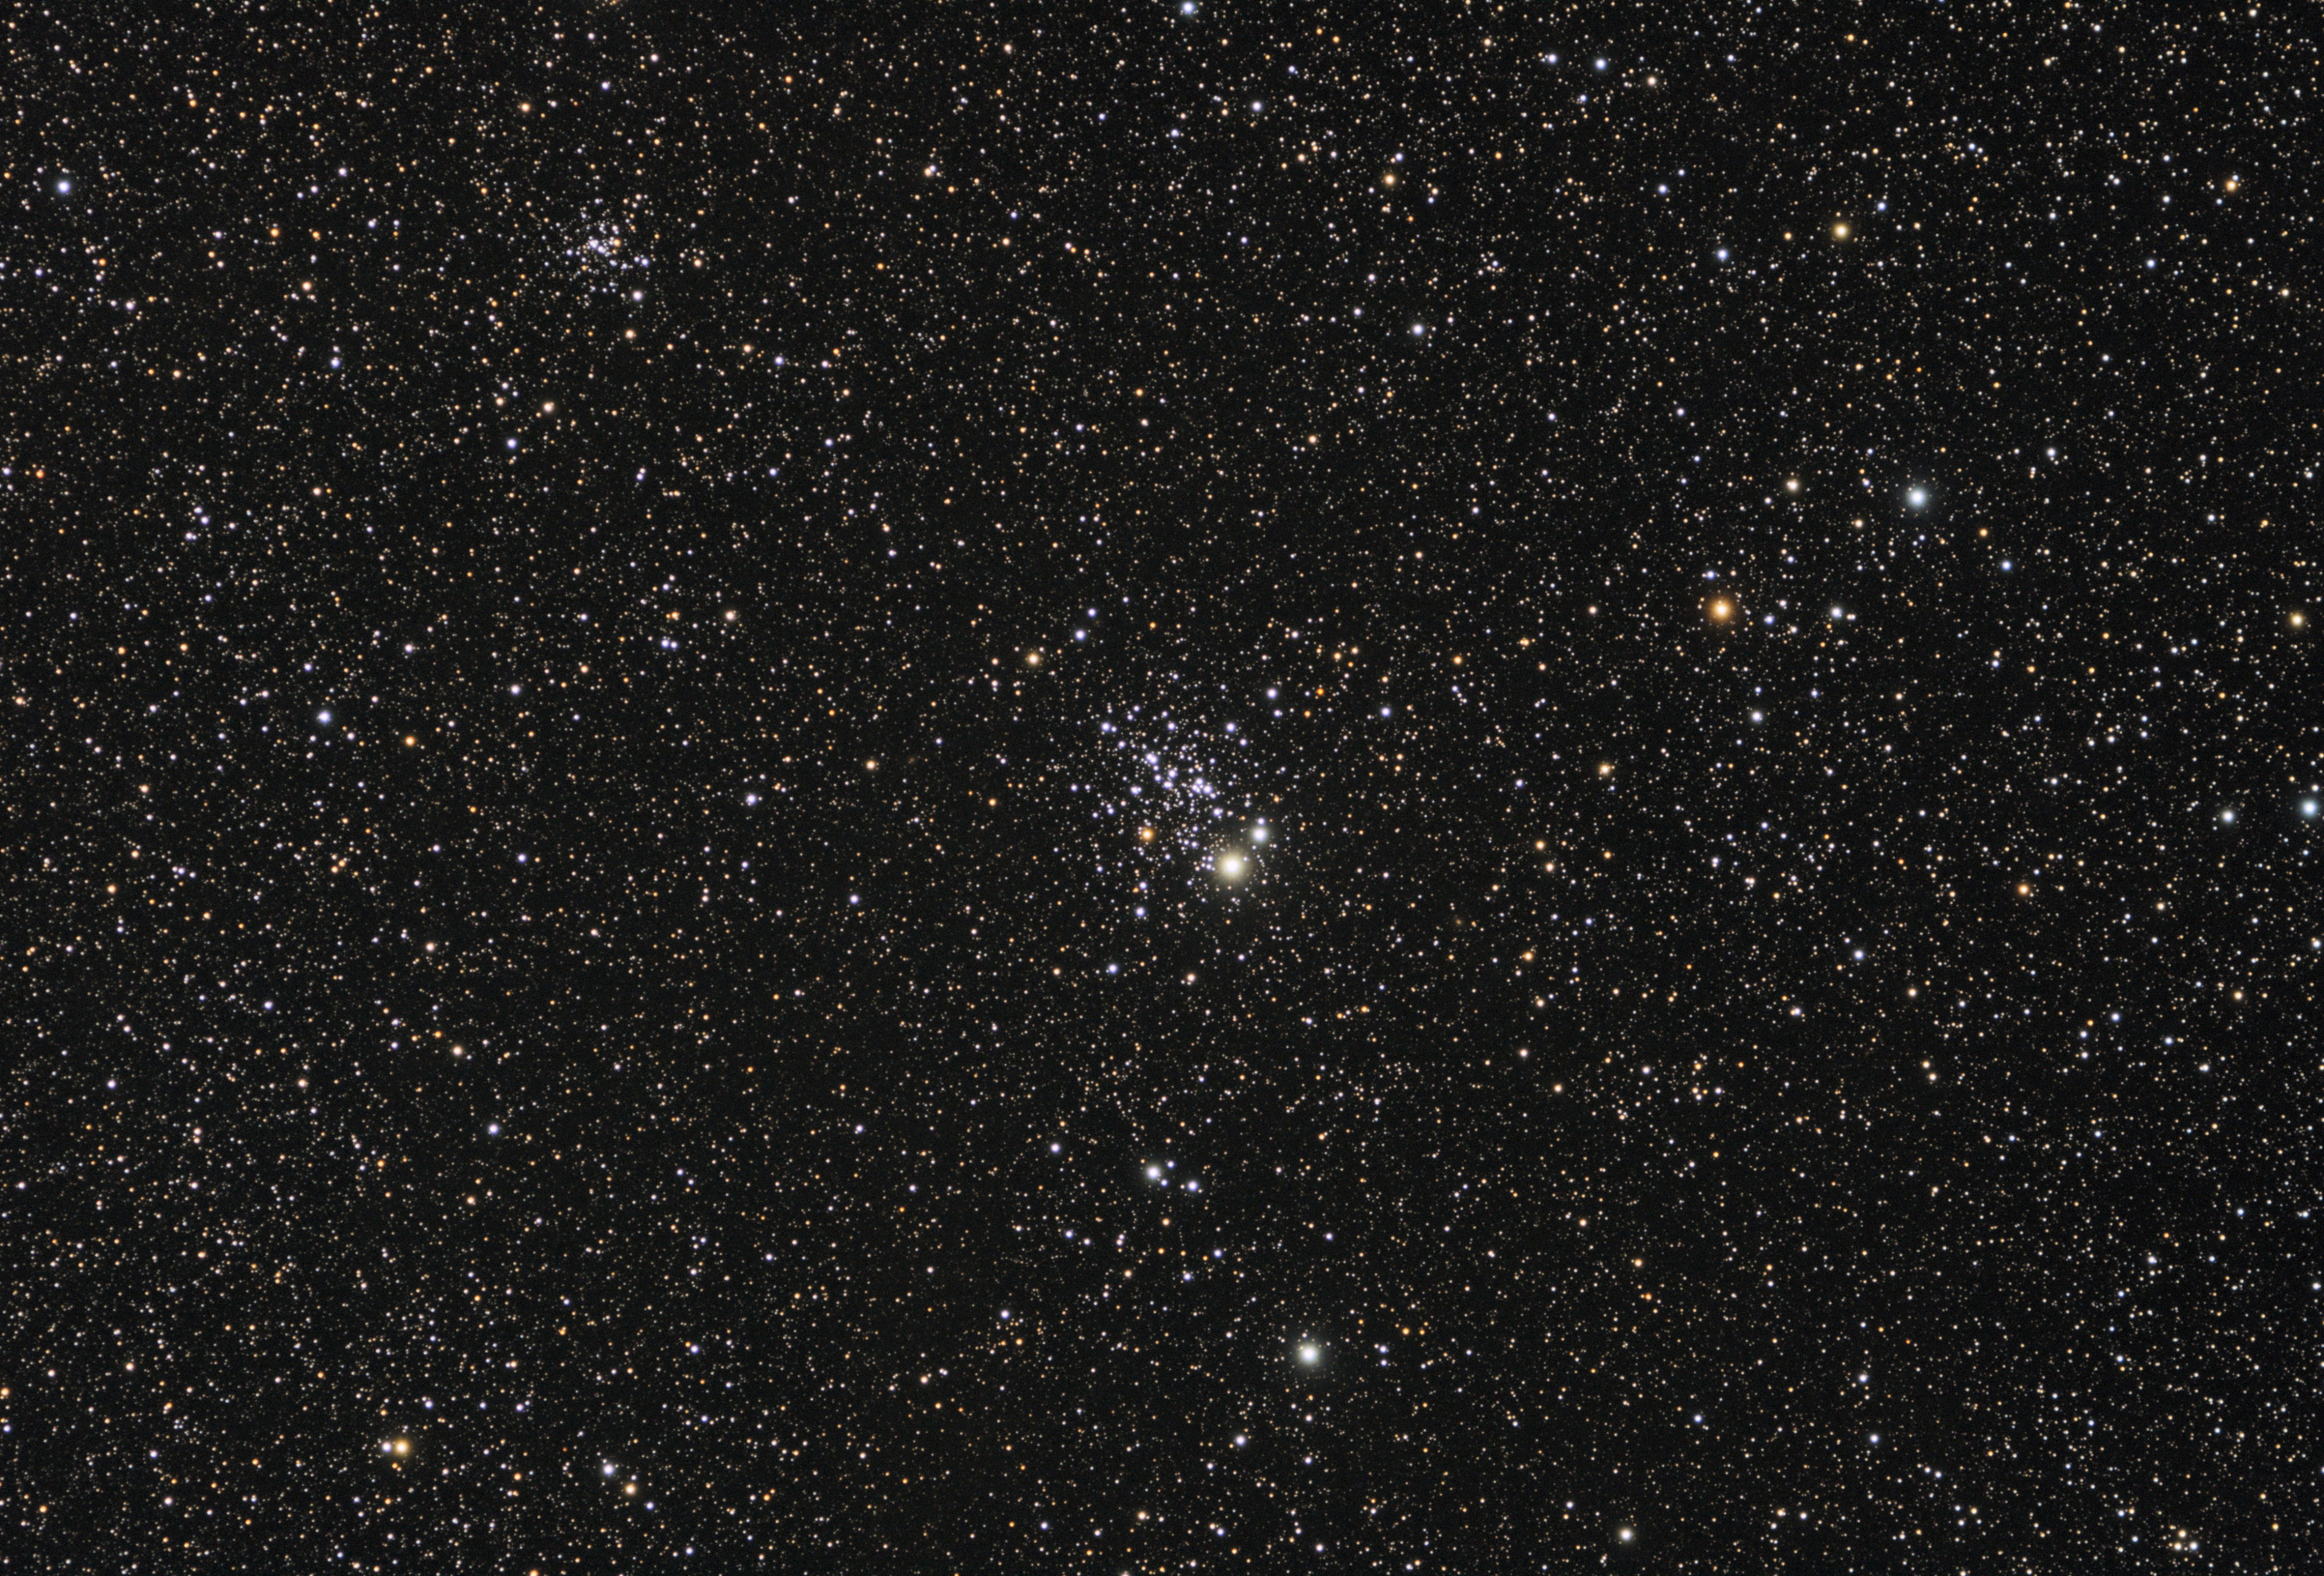 NGC457 20201118 hd.jpg